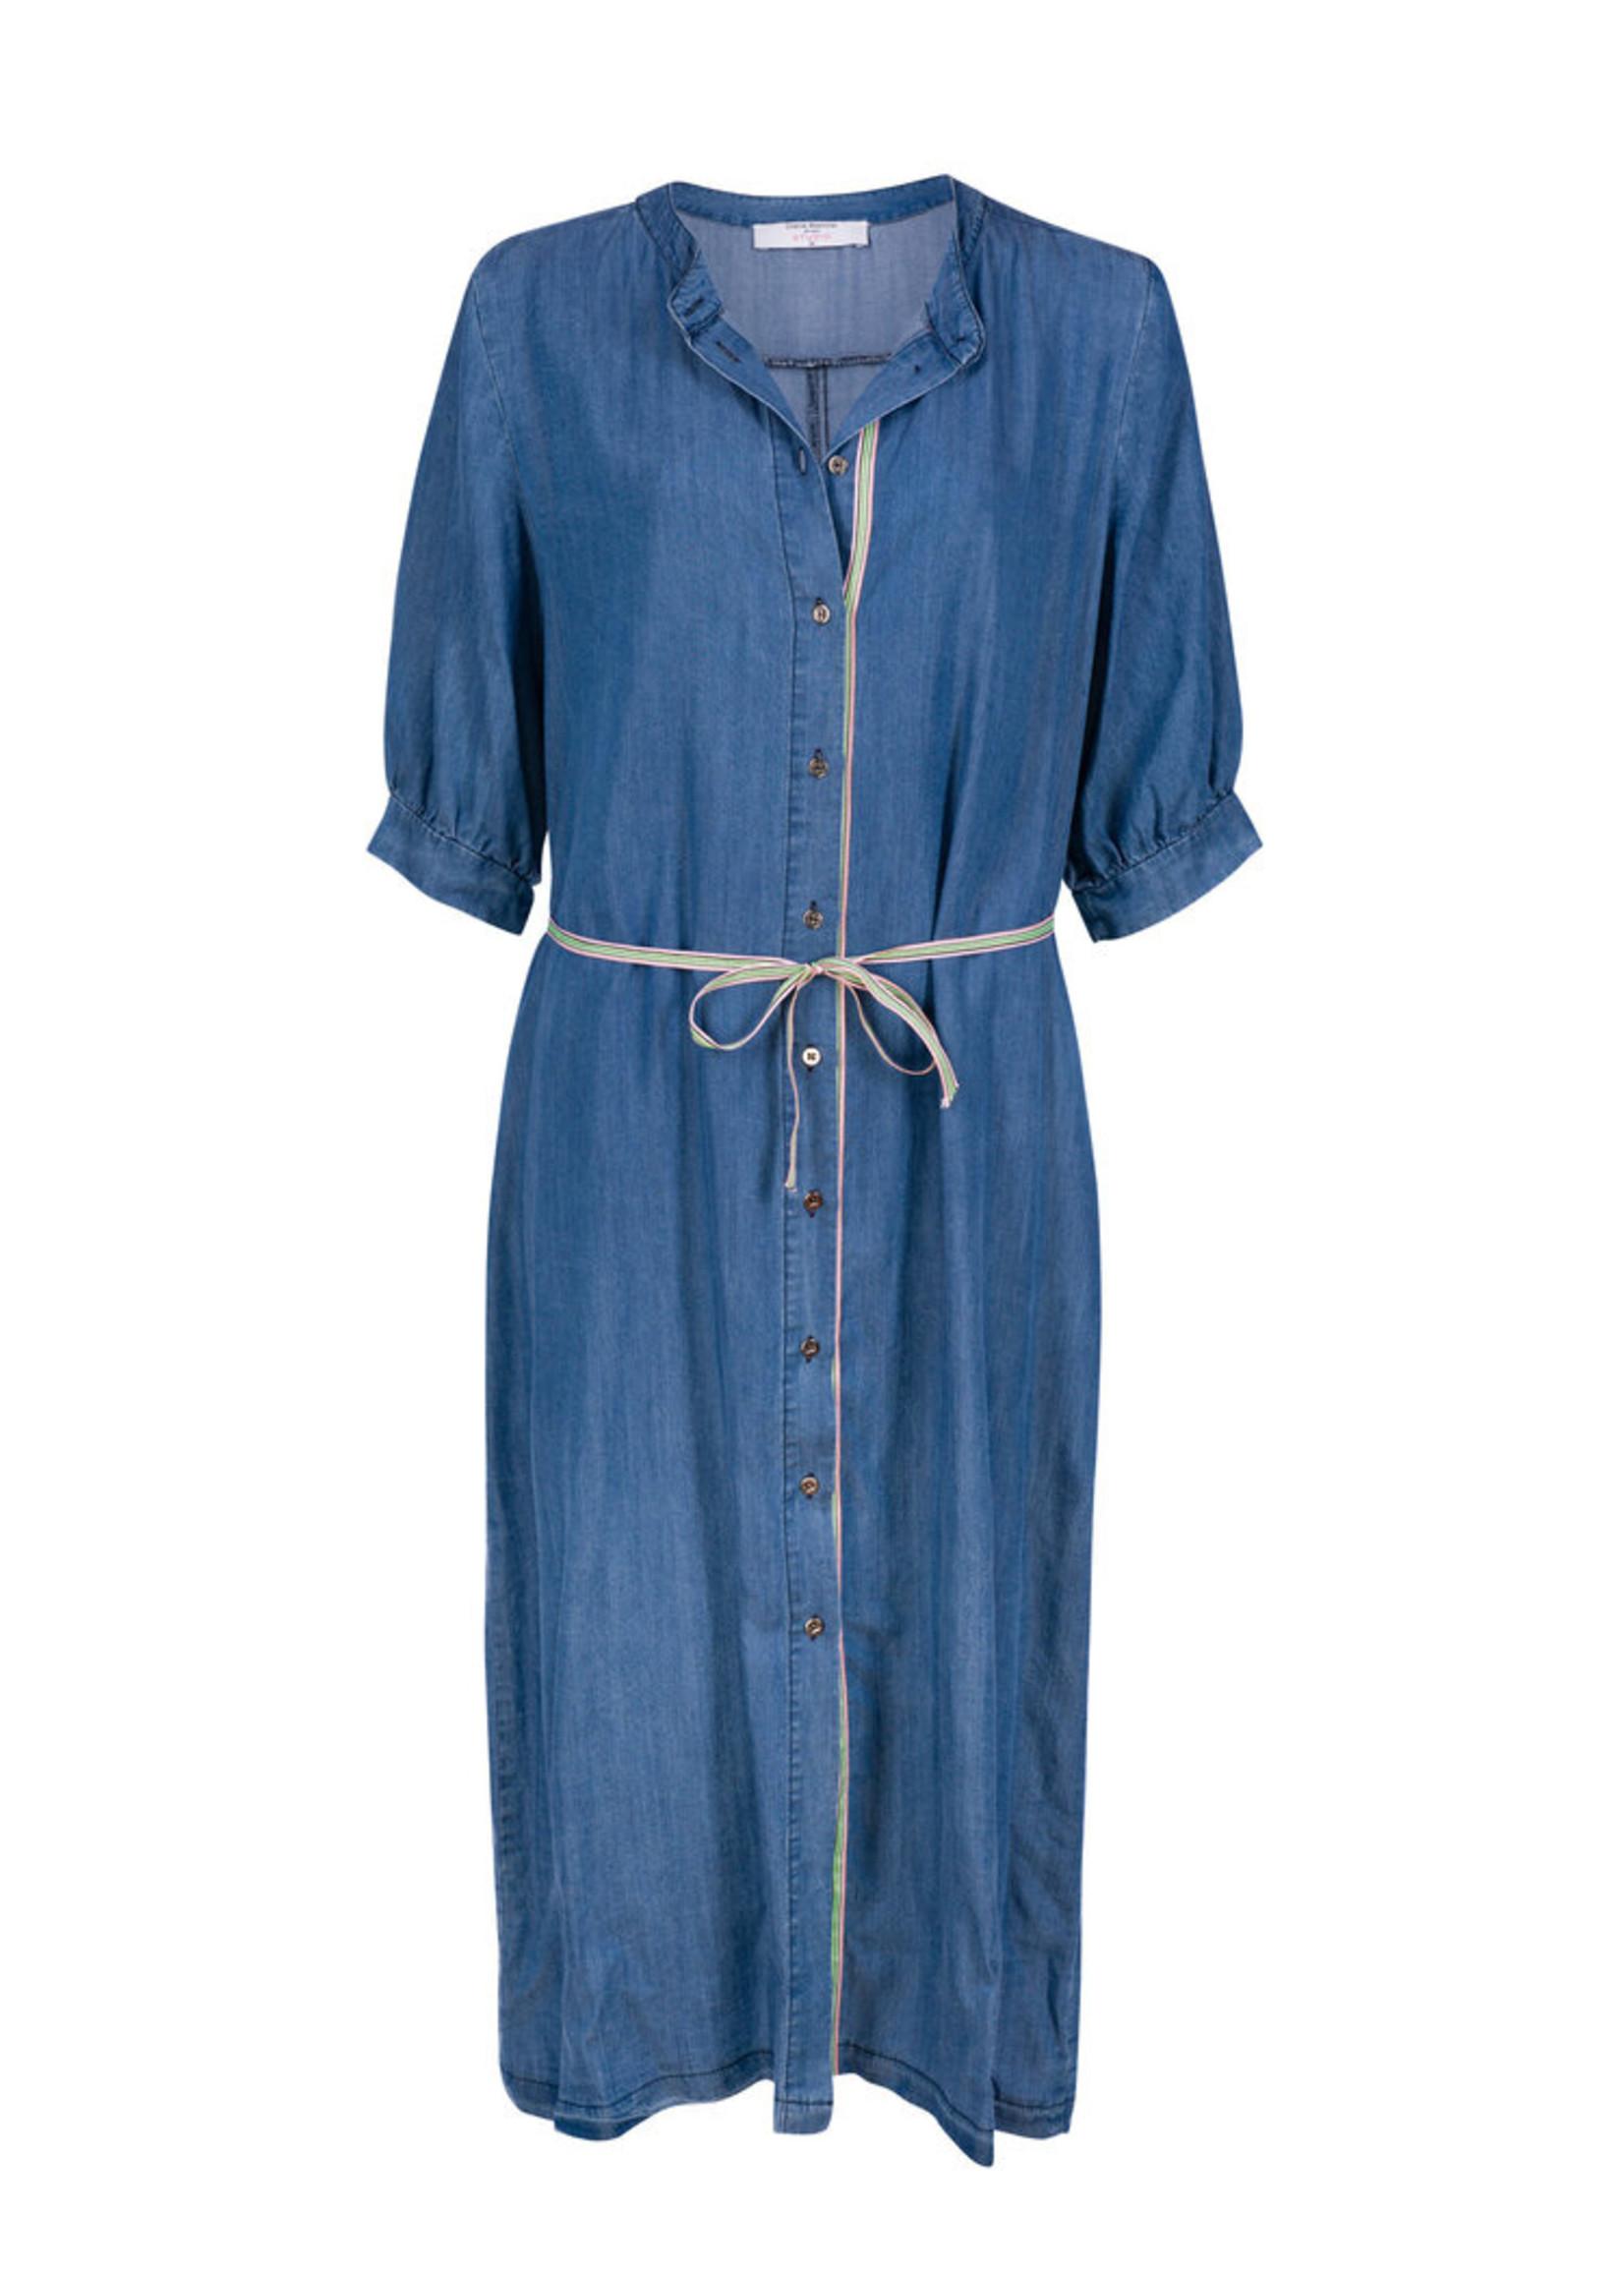 Dame Blanche Dress fano cel blue